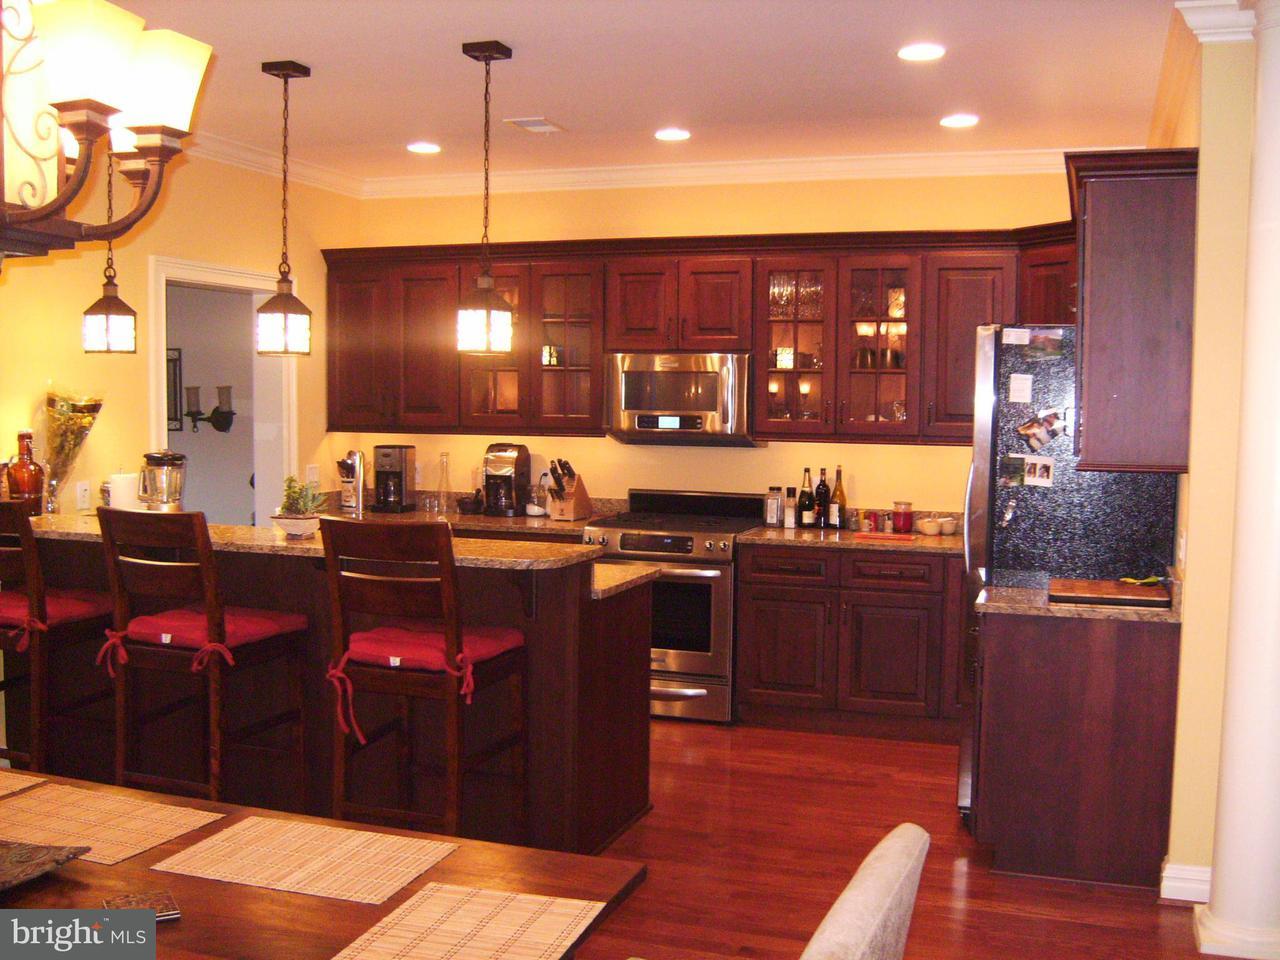 Single Family for Sale at 3293 Battery Park Pl Harrisonburg, Virginia 22801 United States